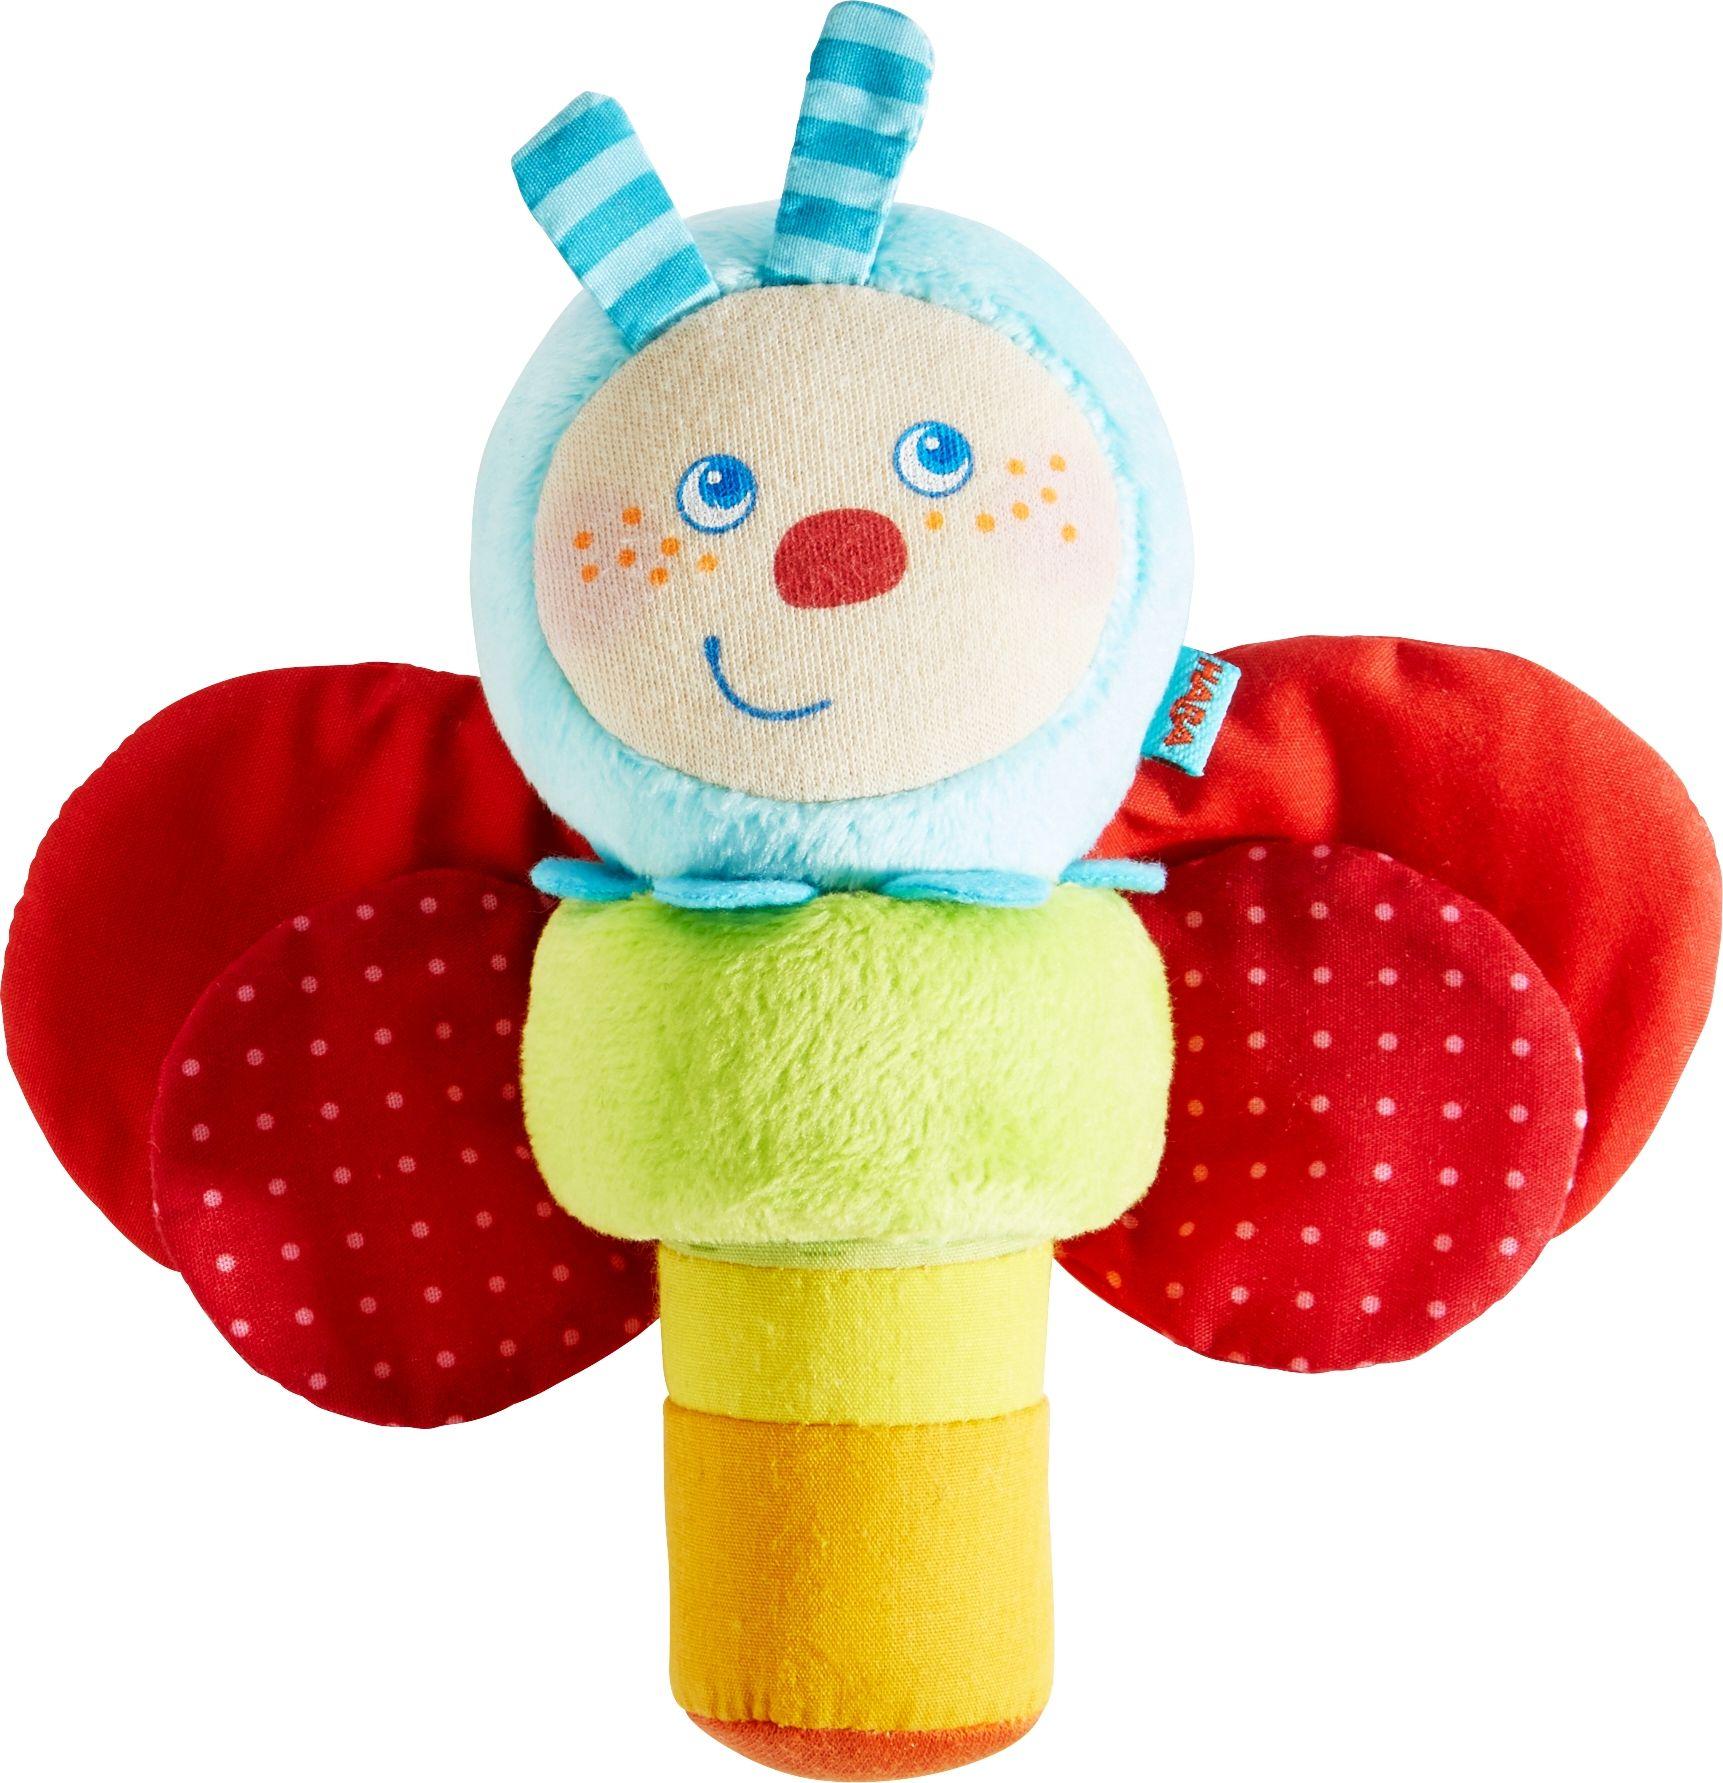 haba caterpillar mina clutching toy acheter sur kidsroom. Black Bedroom Furniture Sets. Home Design Ideas